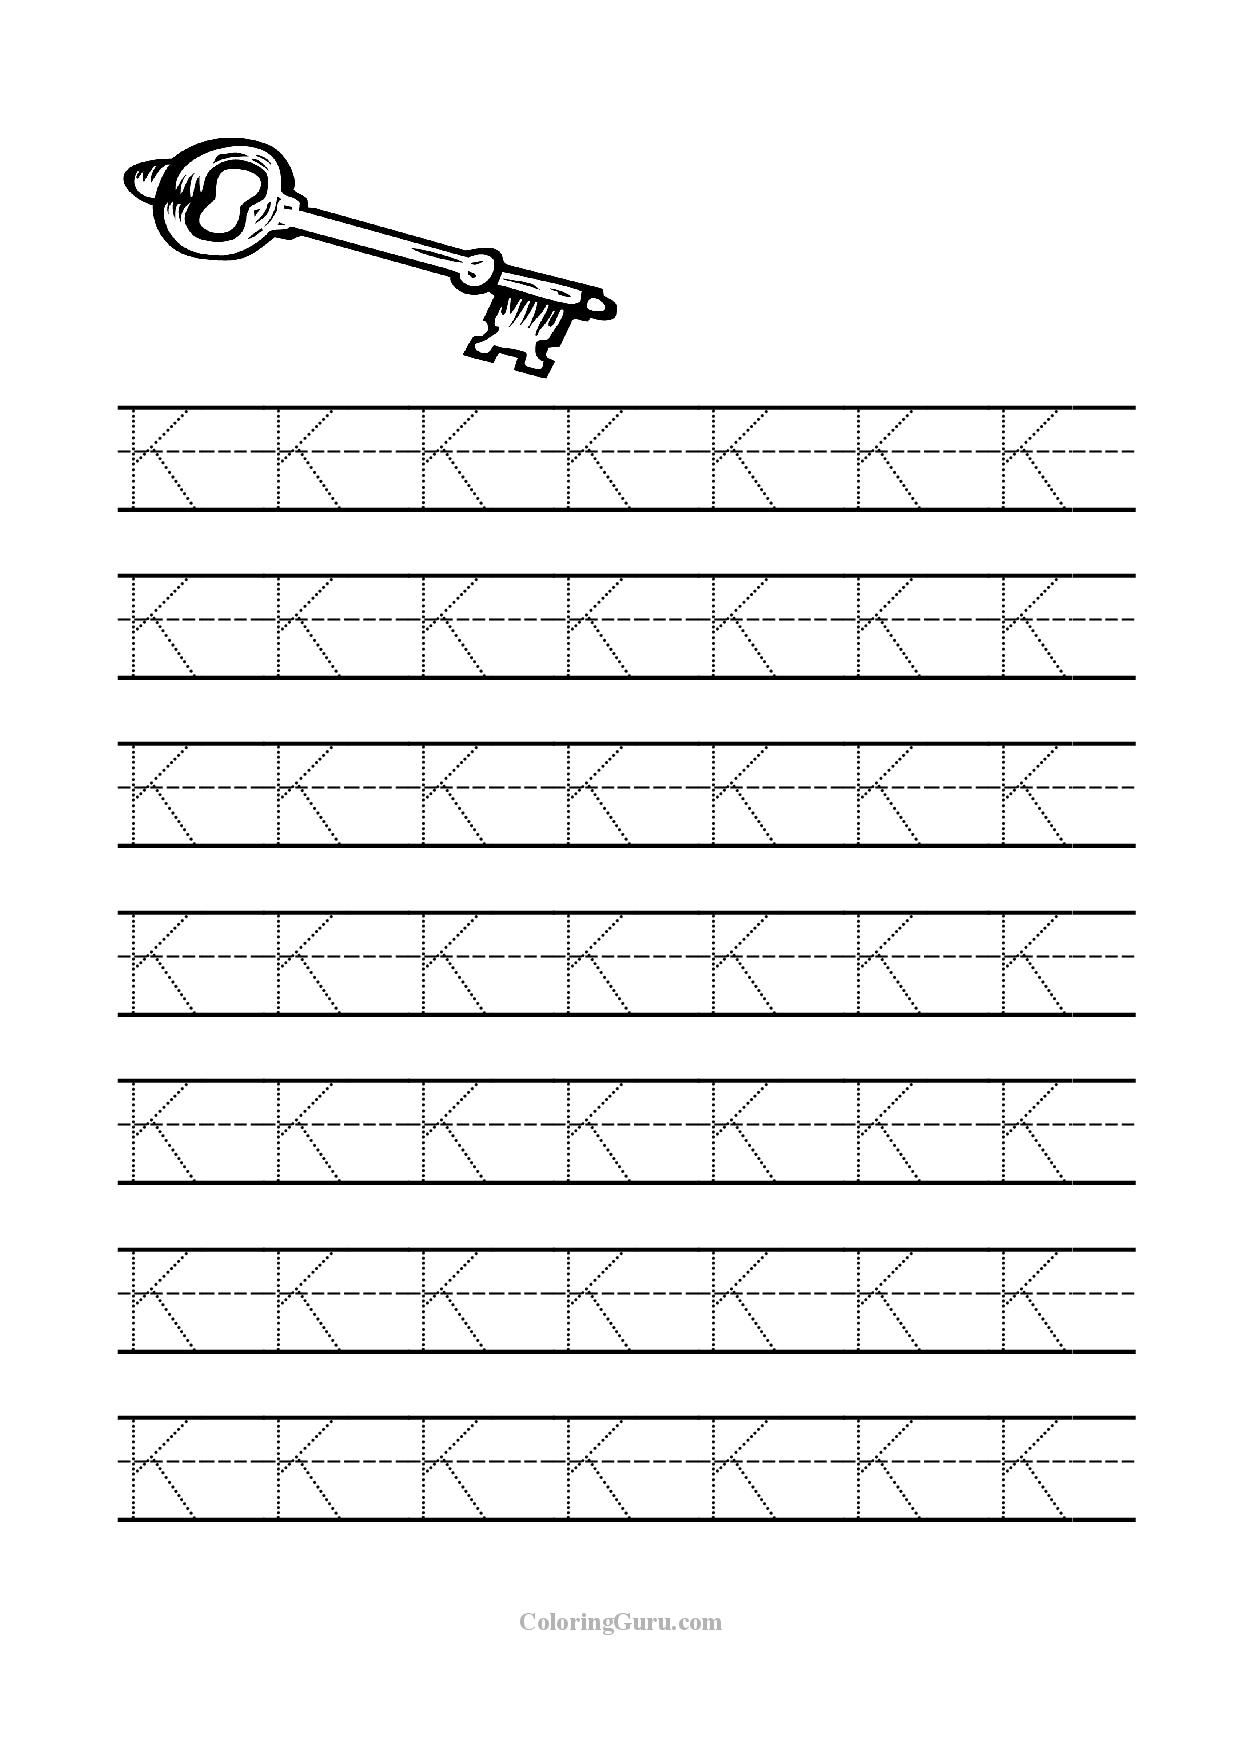 Free Printable Tracing Letter K Worksheets For Preschool | Manuscript Printable Worksheets